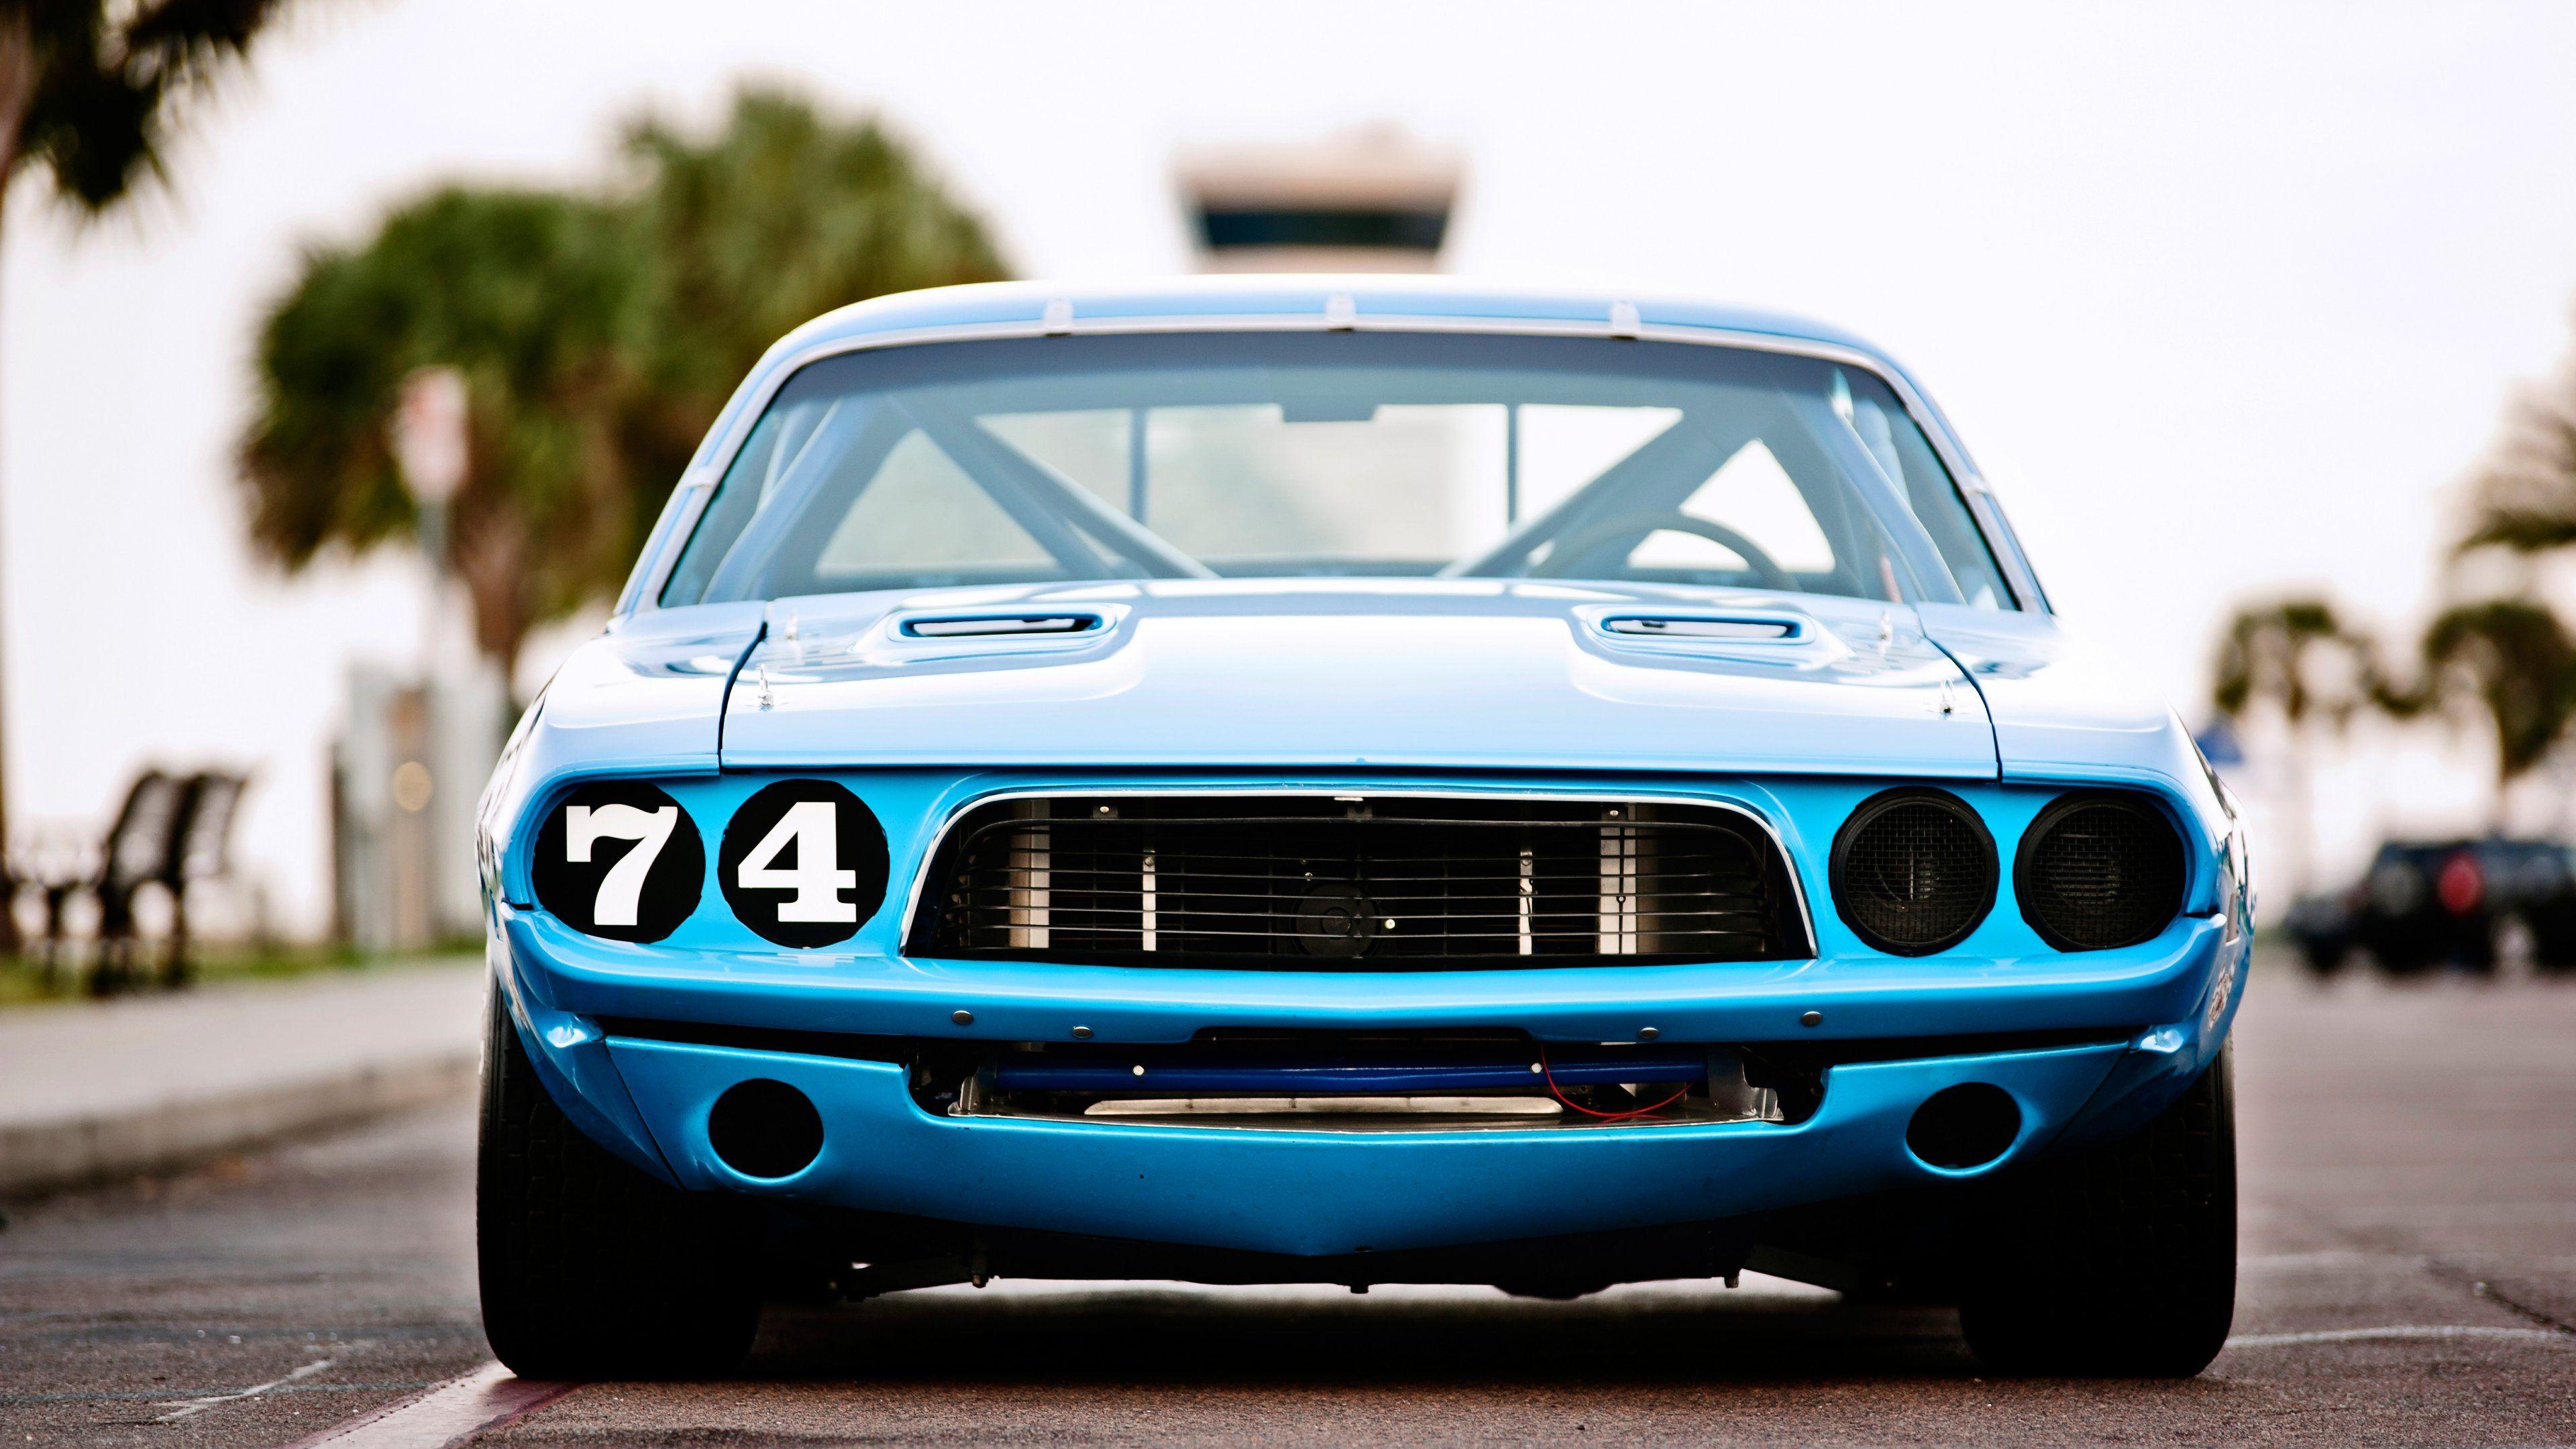 Desktophdwallpaper Org Dodge Challenger Nascar Race Cars Dodge